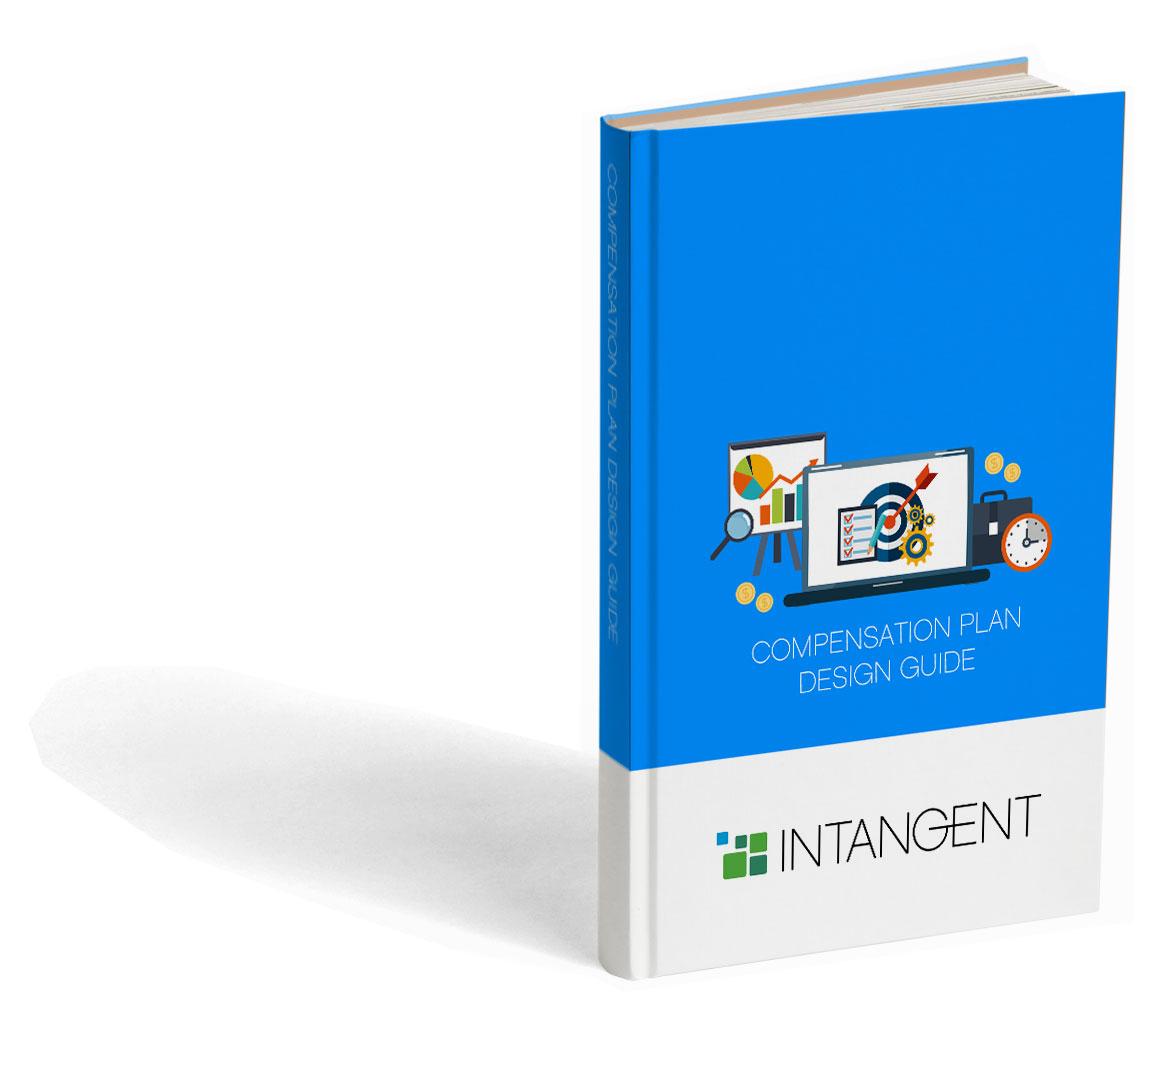 Intangent's Compensation Plan Design Guide